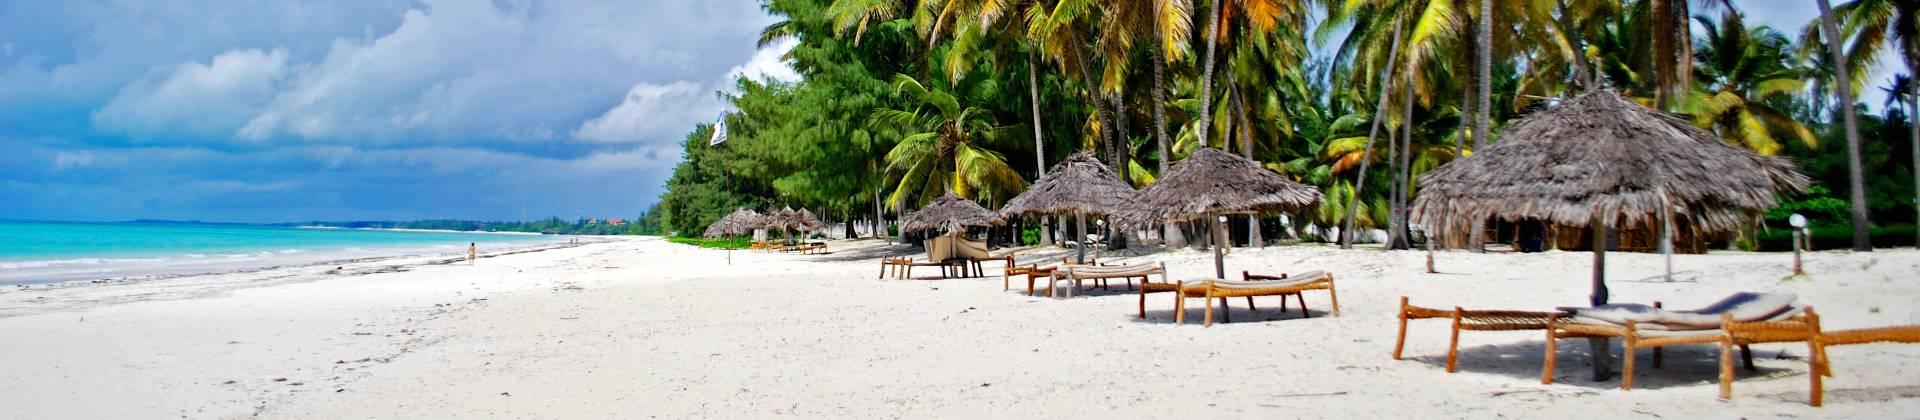 paradijselijke stranden in Tanzania